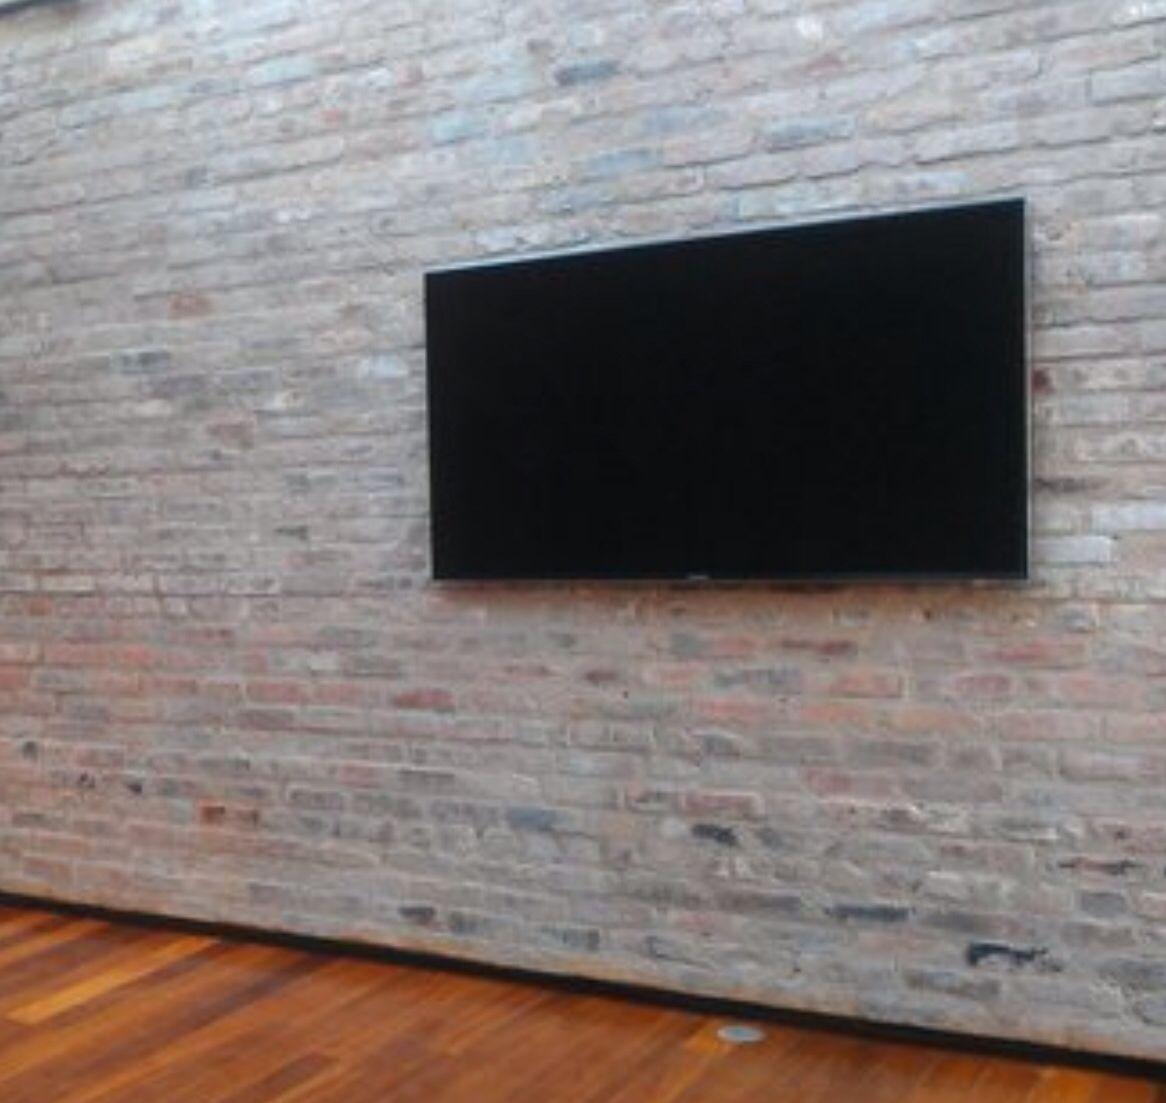 Tv Mounted On Brick Wall With No Visible Cables Bonus